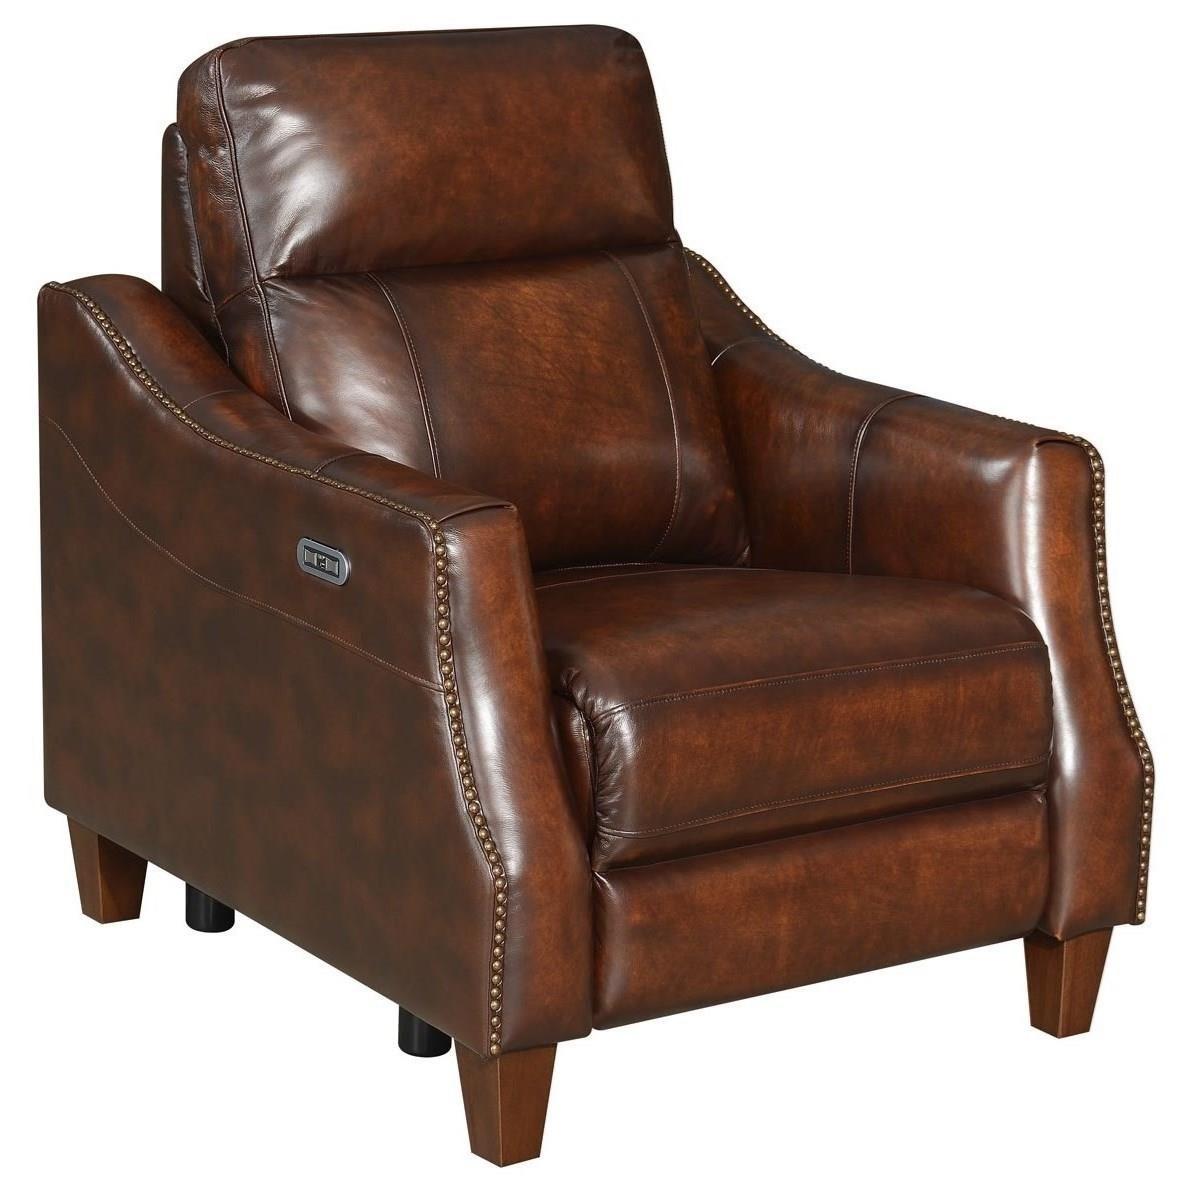 Akari Dual-Power Recliner Chair by Steve Silver at Van Hill Furniture